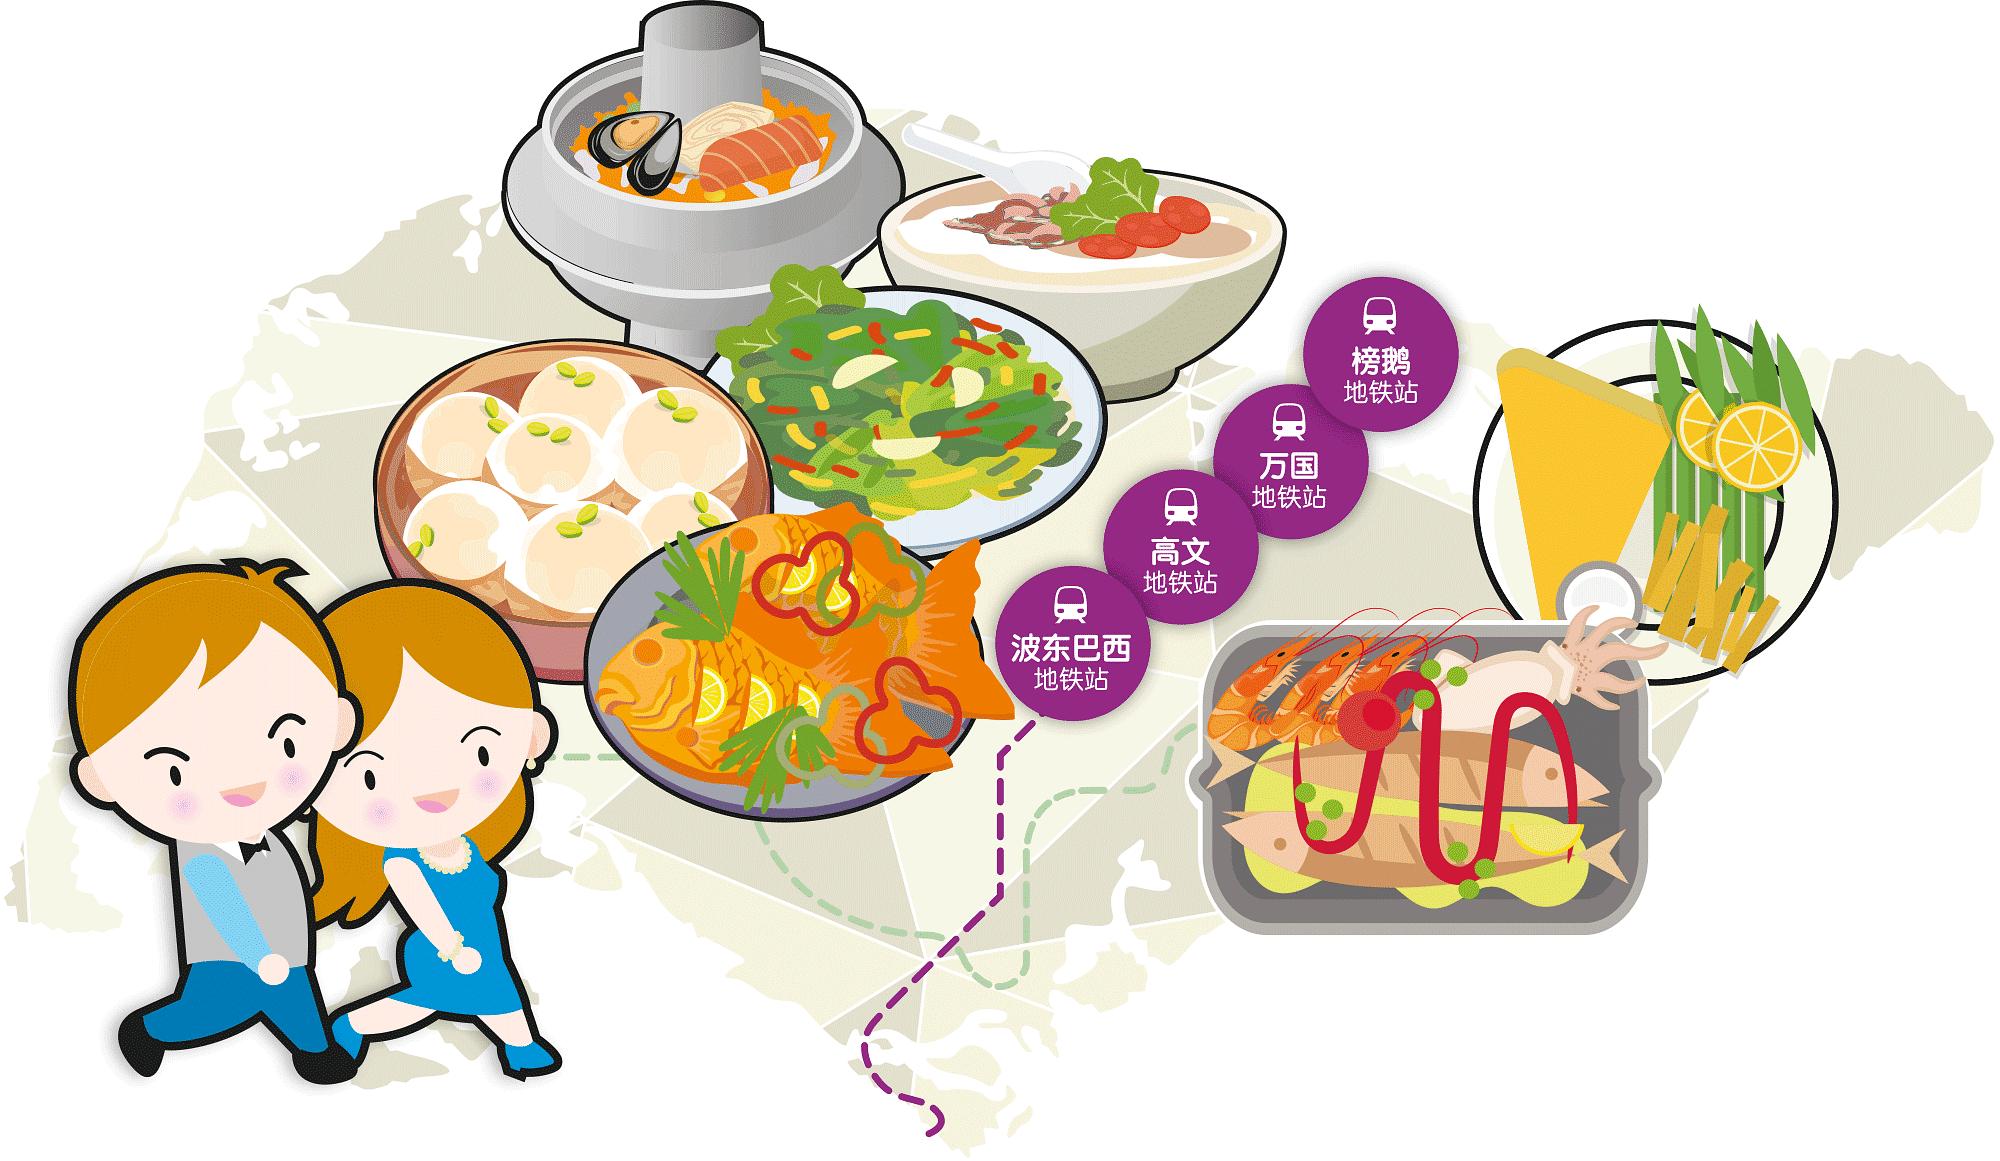 Wanbao Food Search @Northeast MRT Stations